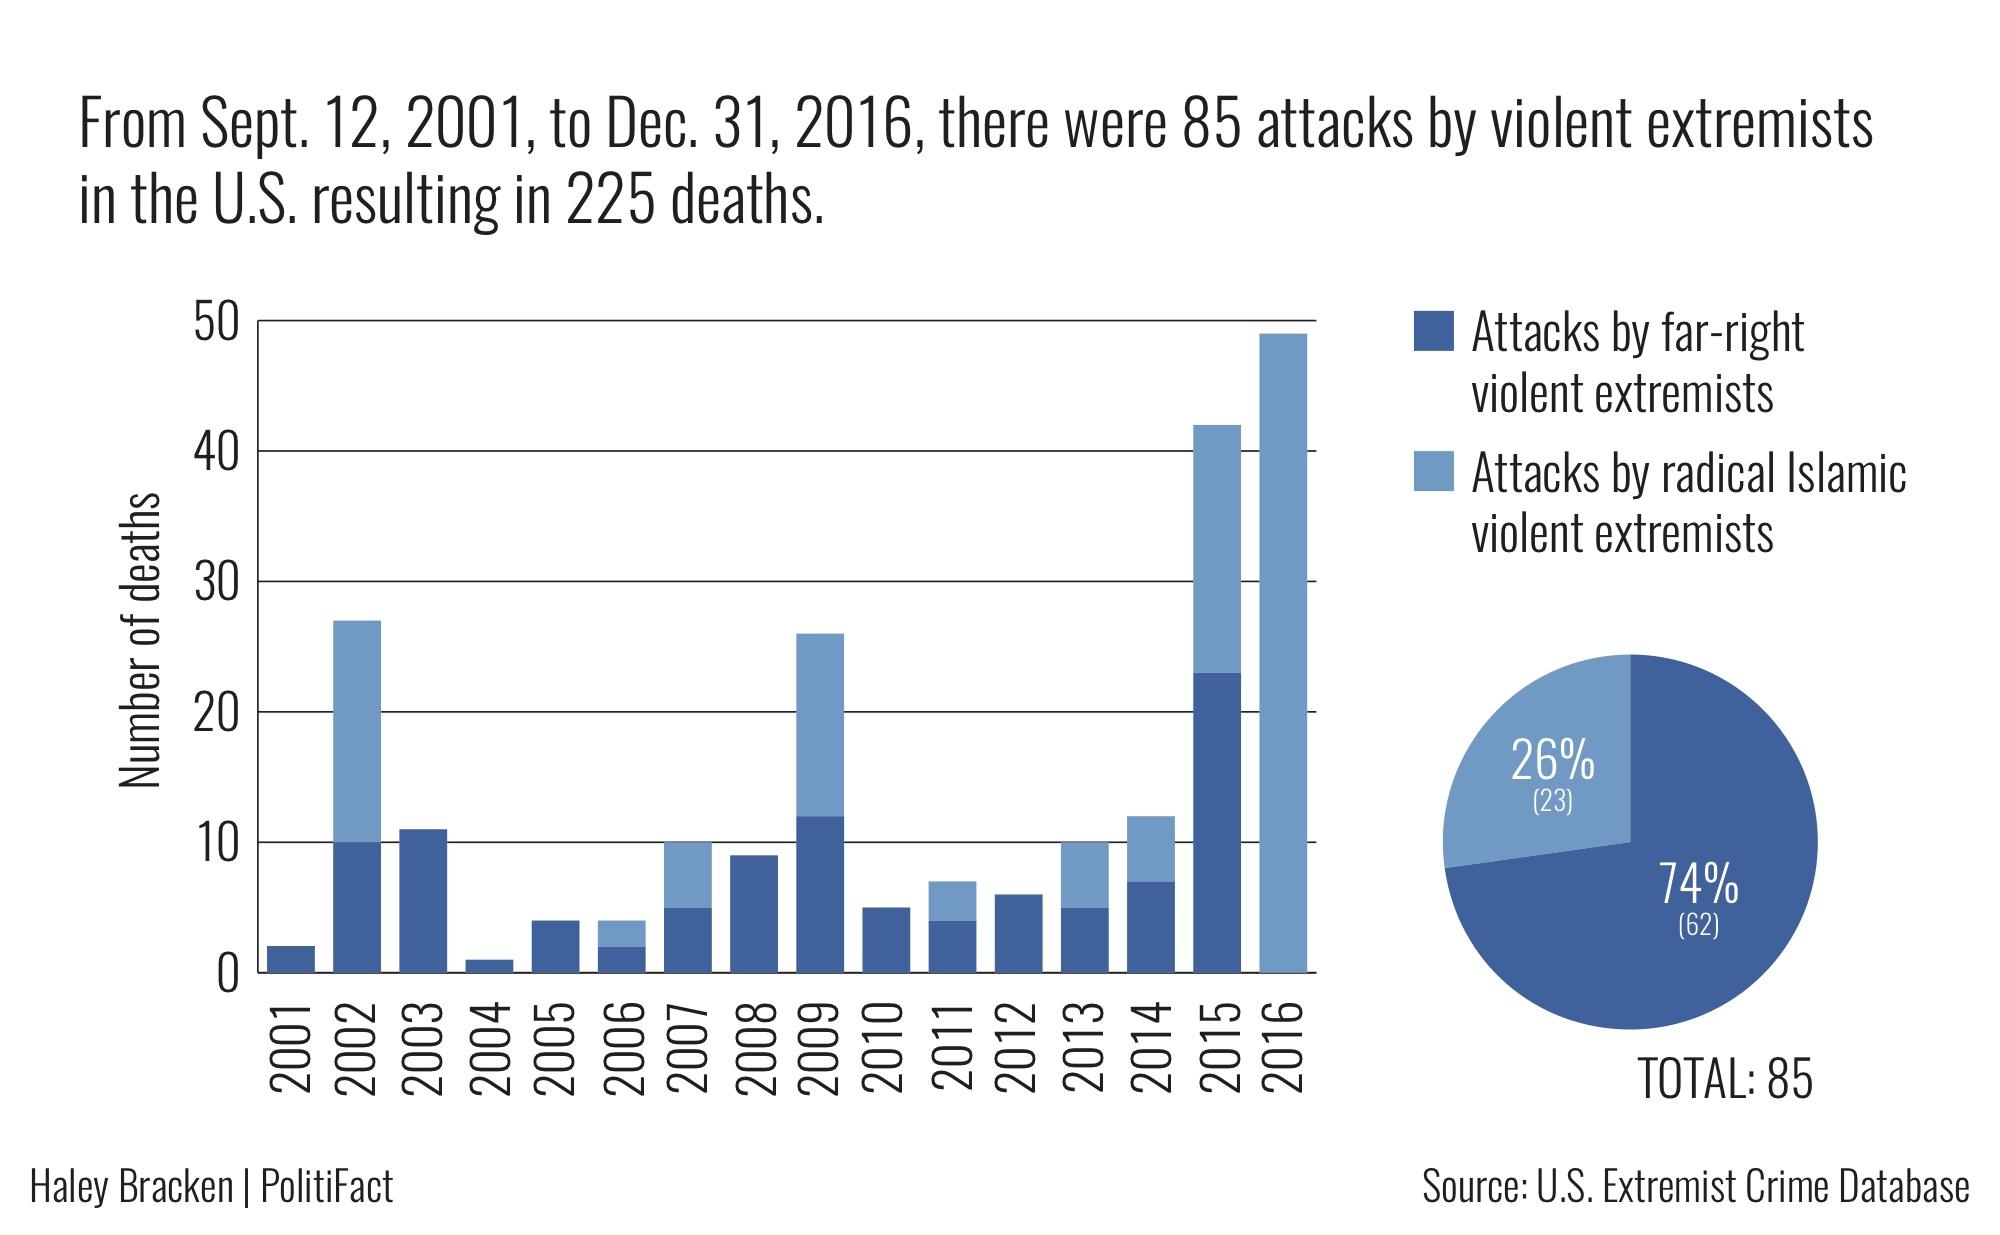 https://cdn.discordapp.com/attachments/372507611284766722/426217369430654989/ExtremistGraph1_2.jpg